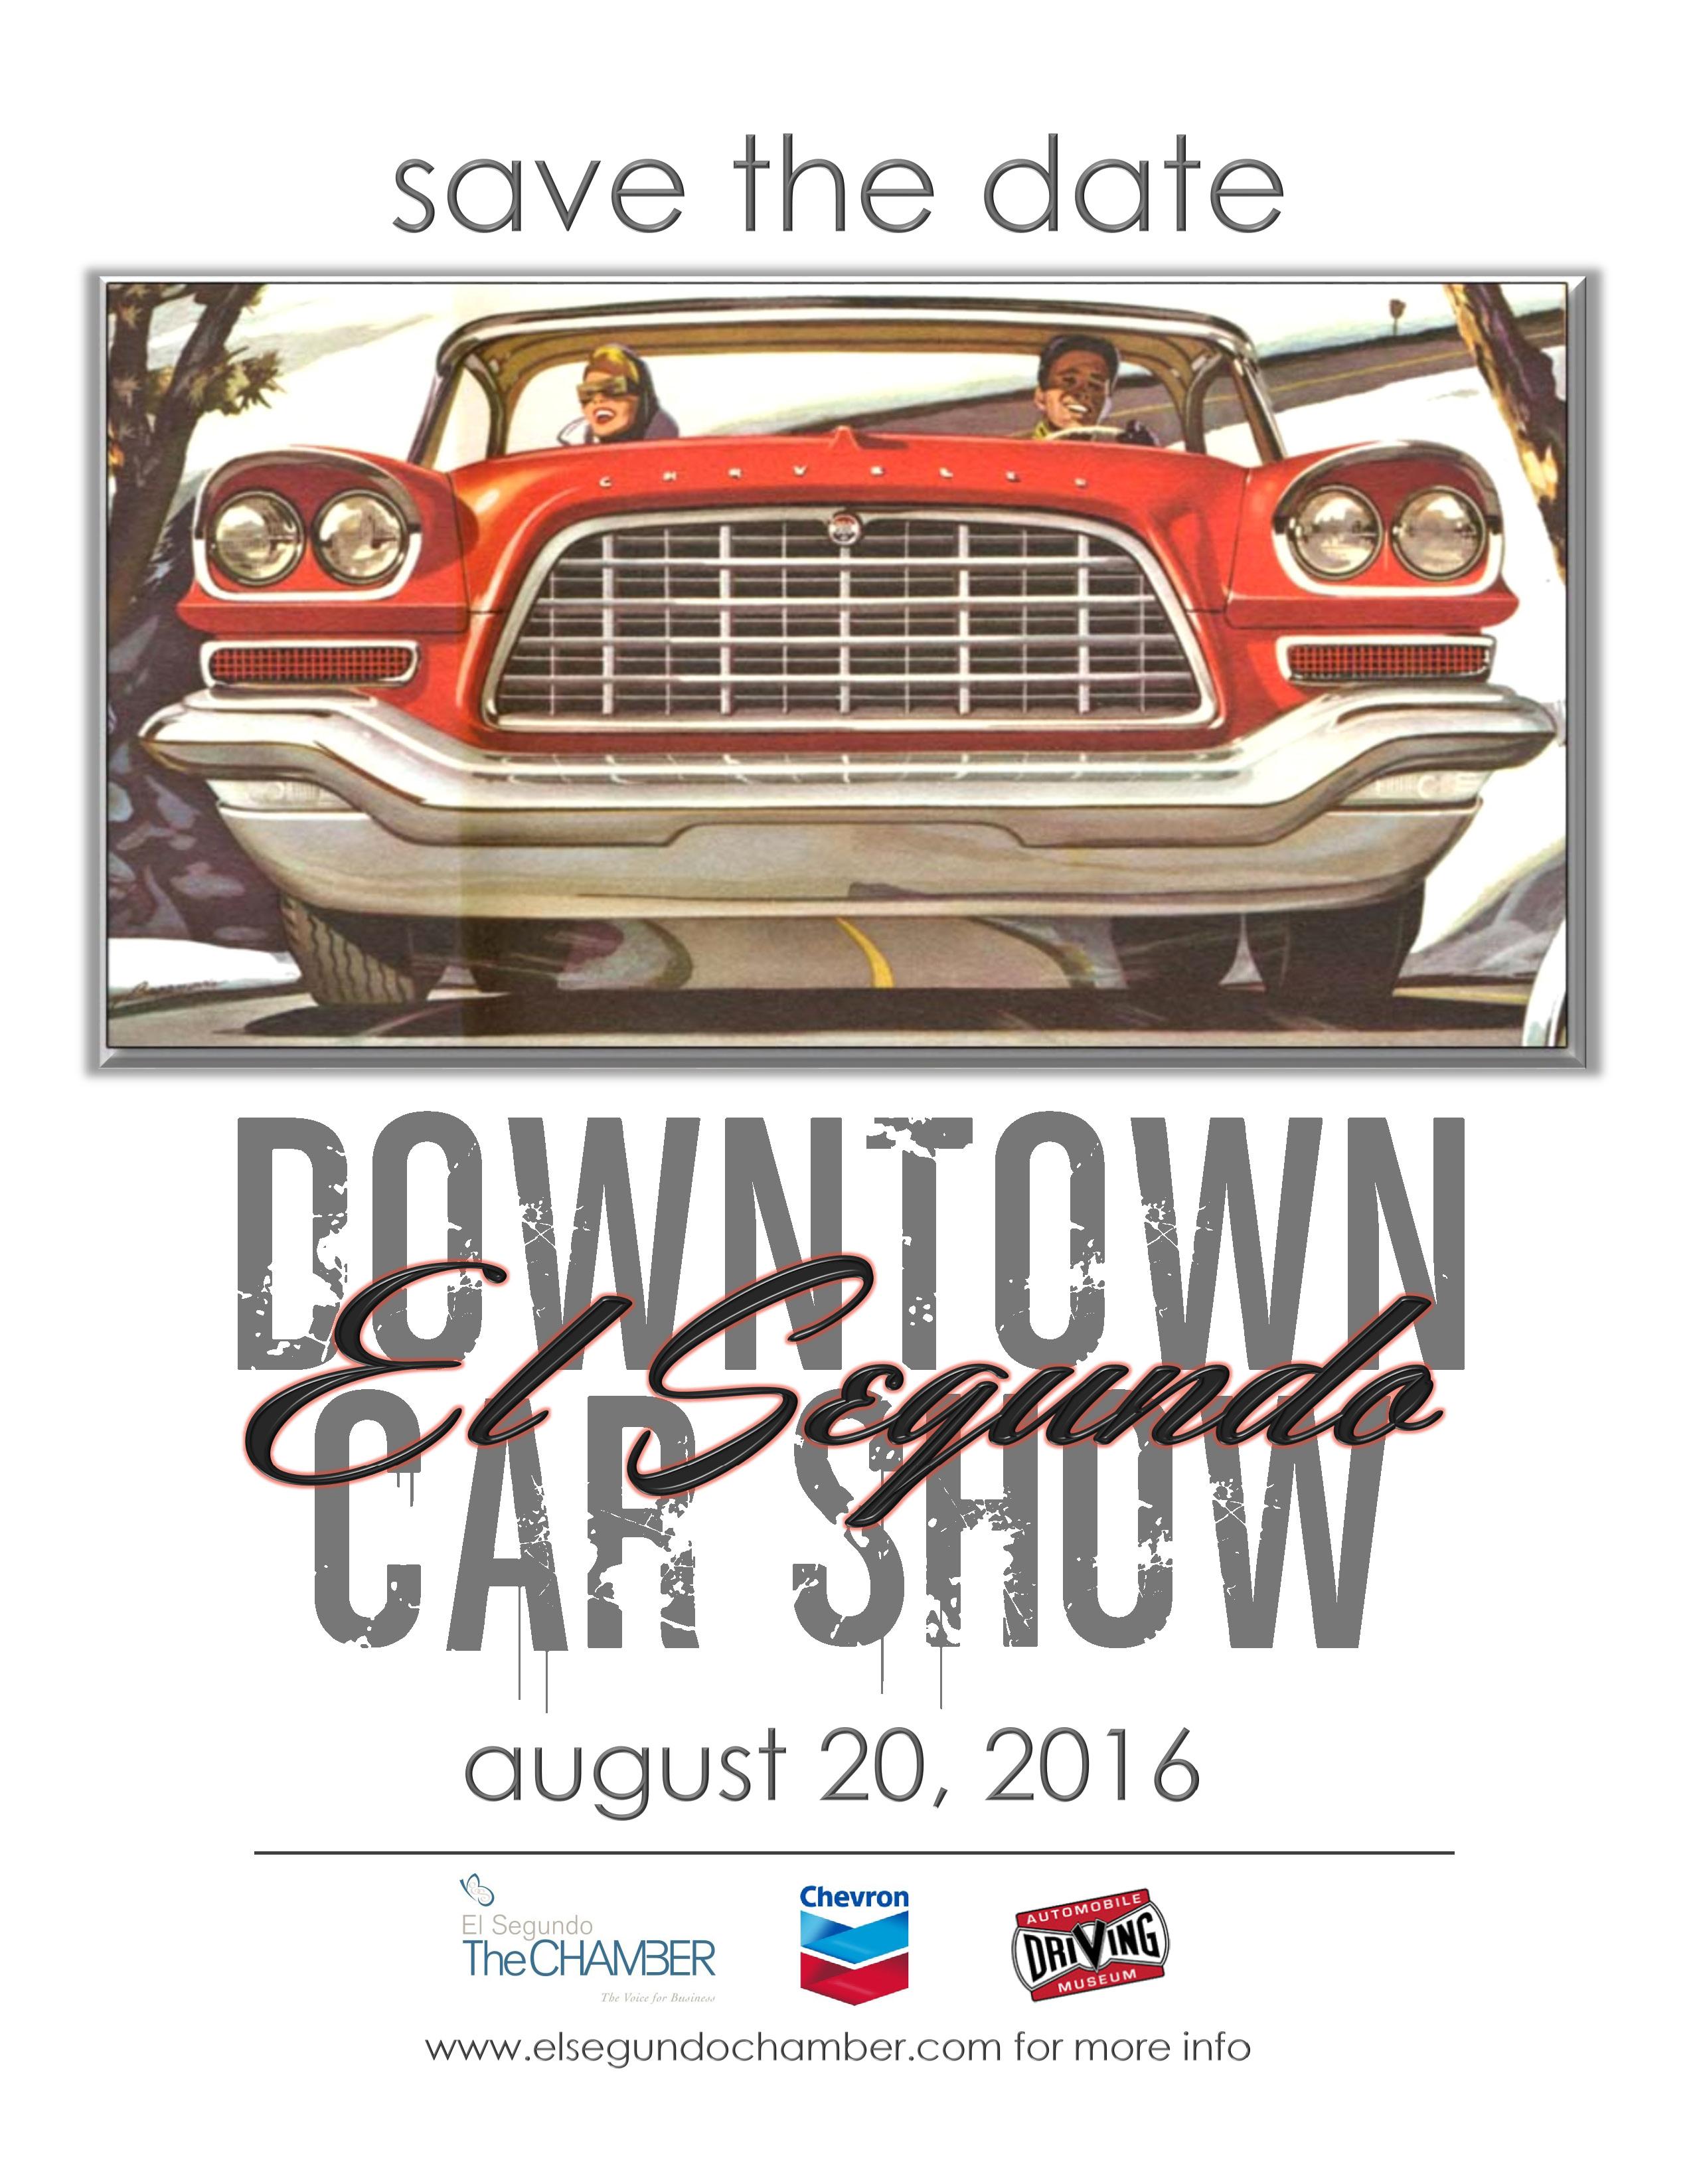 Downtown El Segundo Main Street Car Show Car Show Radar - Main street car show